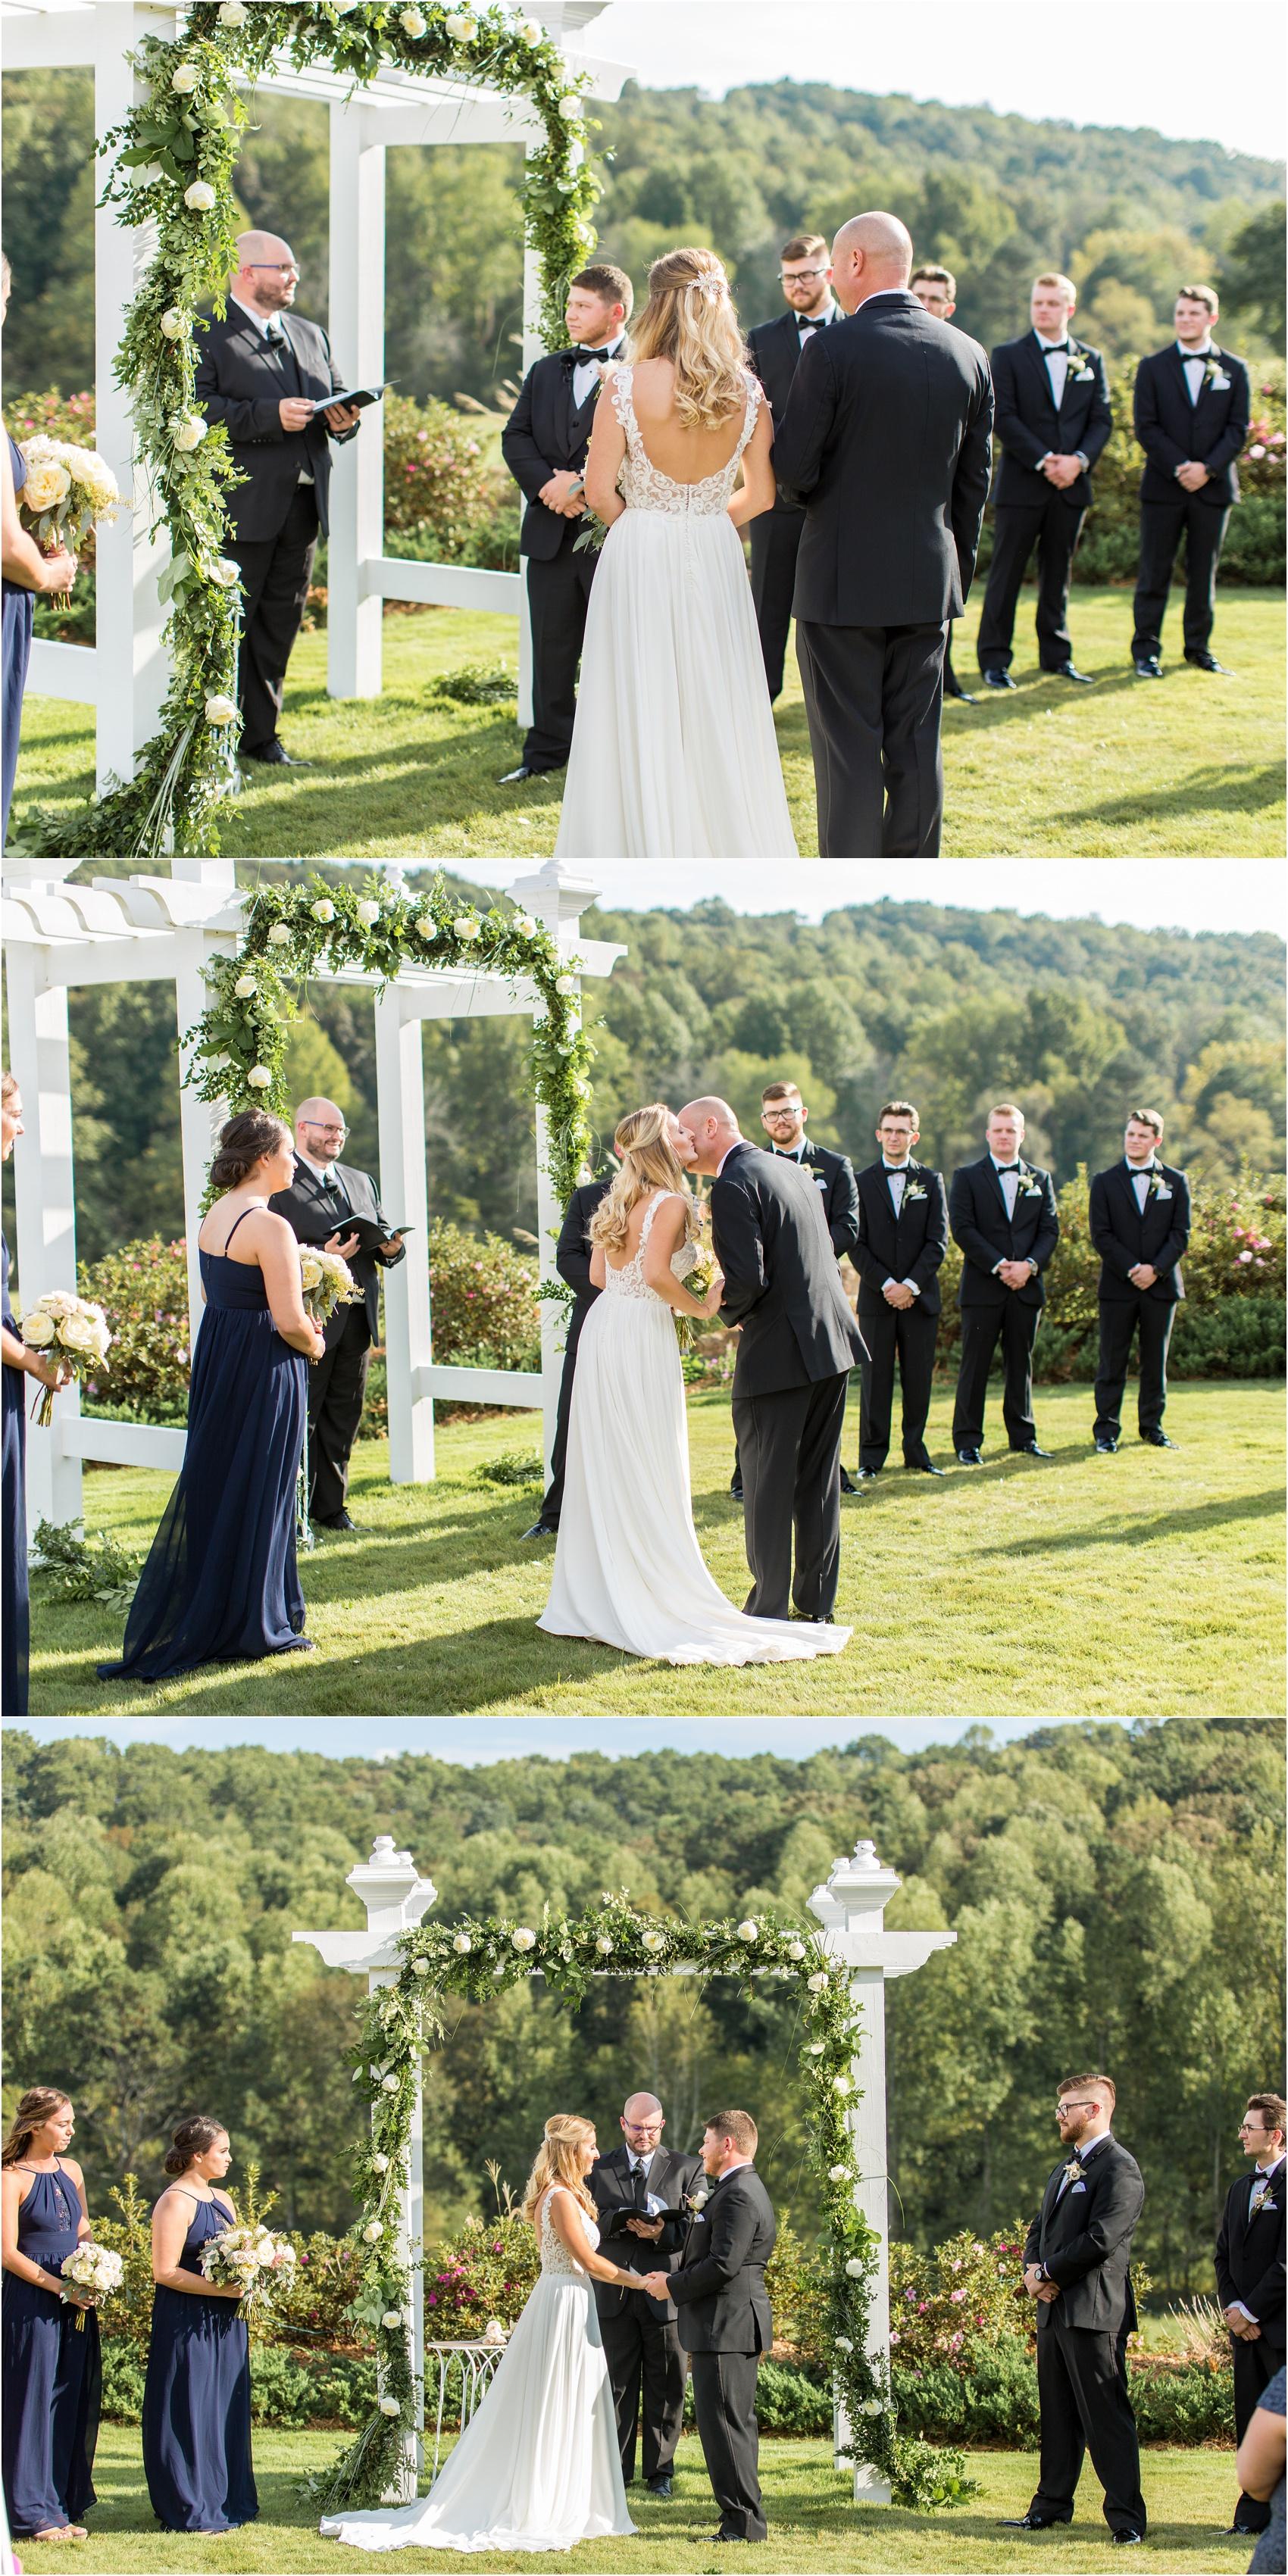 Savannah Eve Photography- Jurek-Woodworth Wedding- Sneak Peek-36.jpg